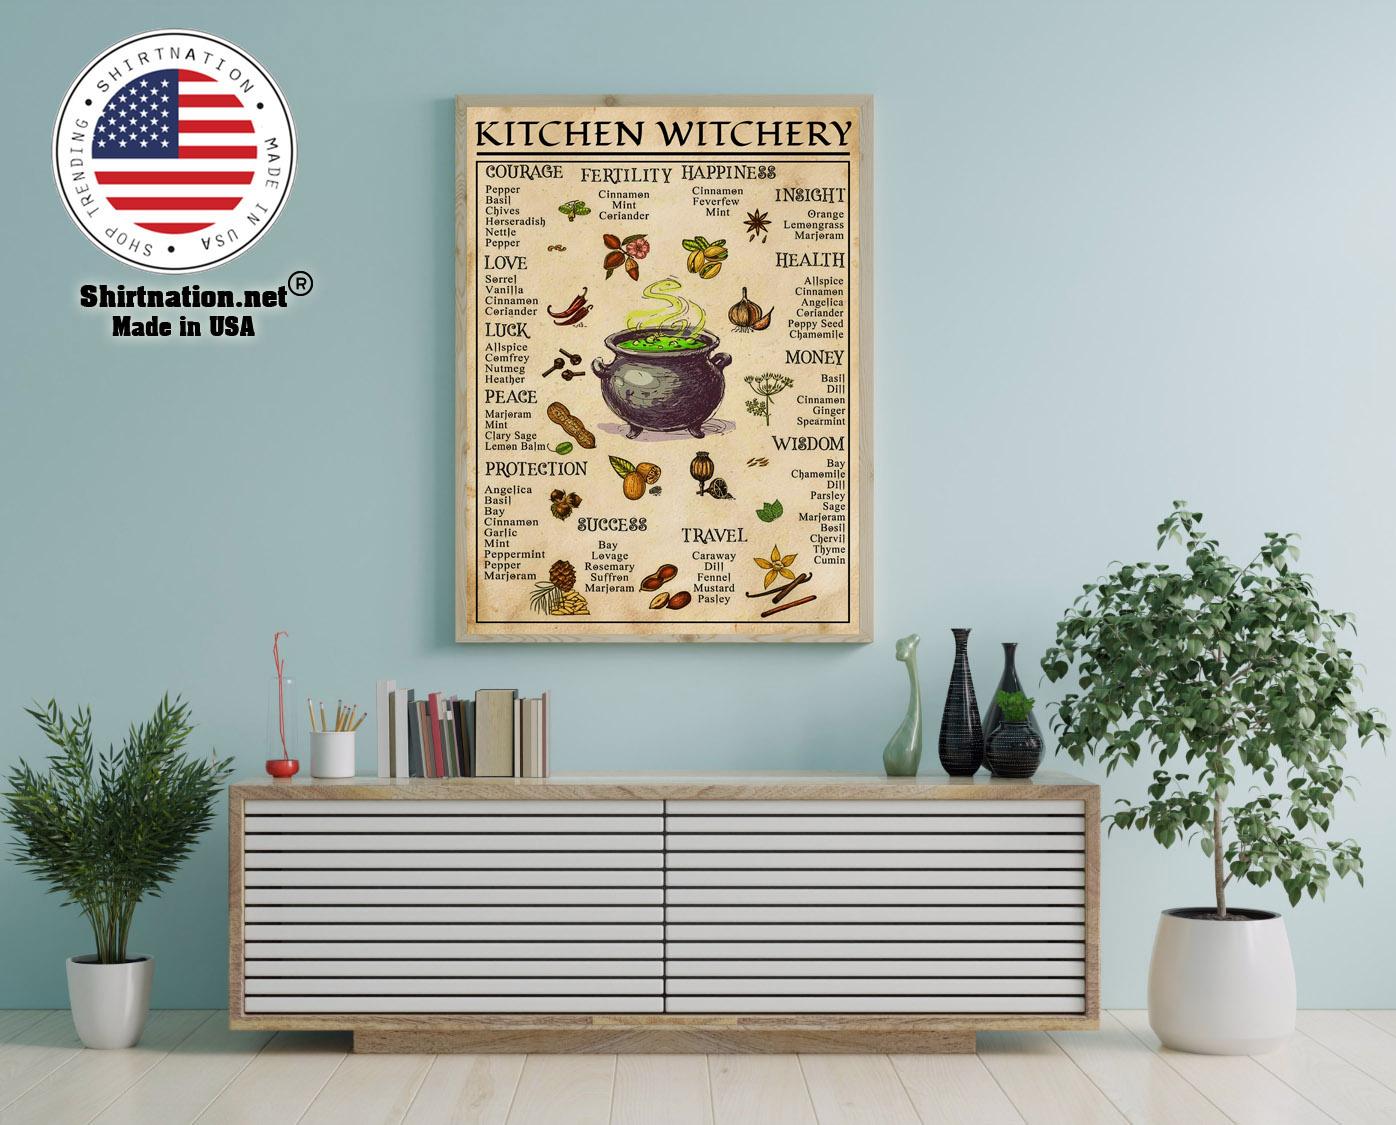 Kitchen witchery poster 12